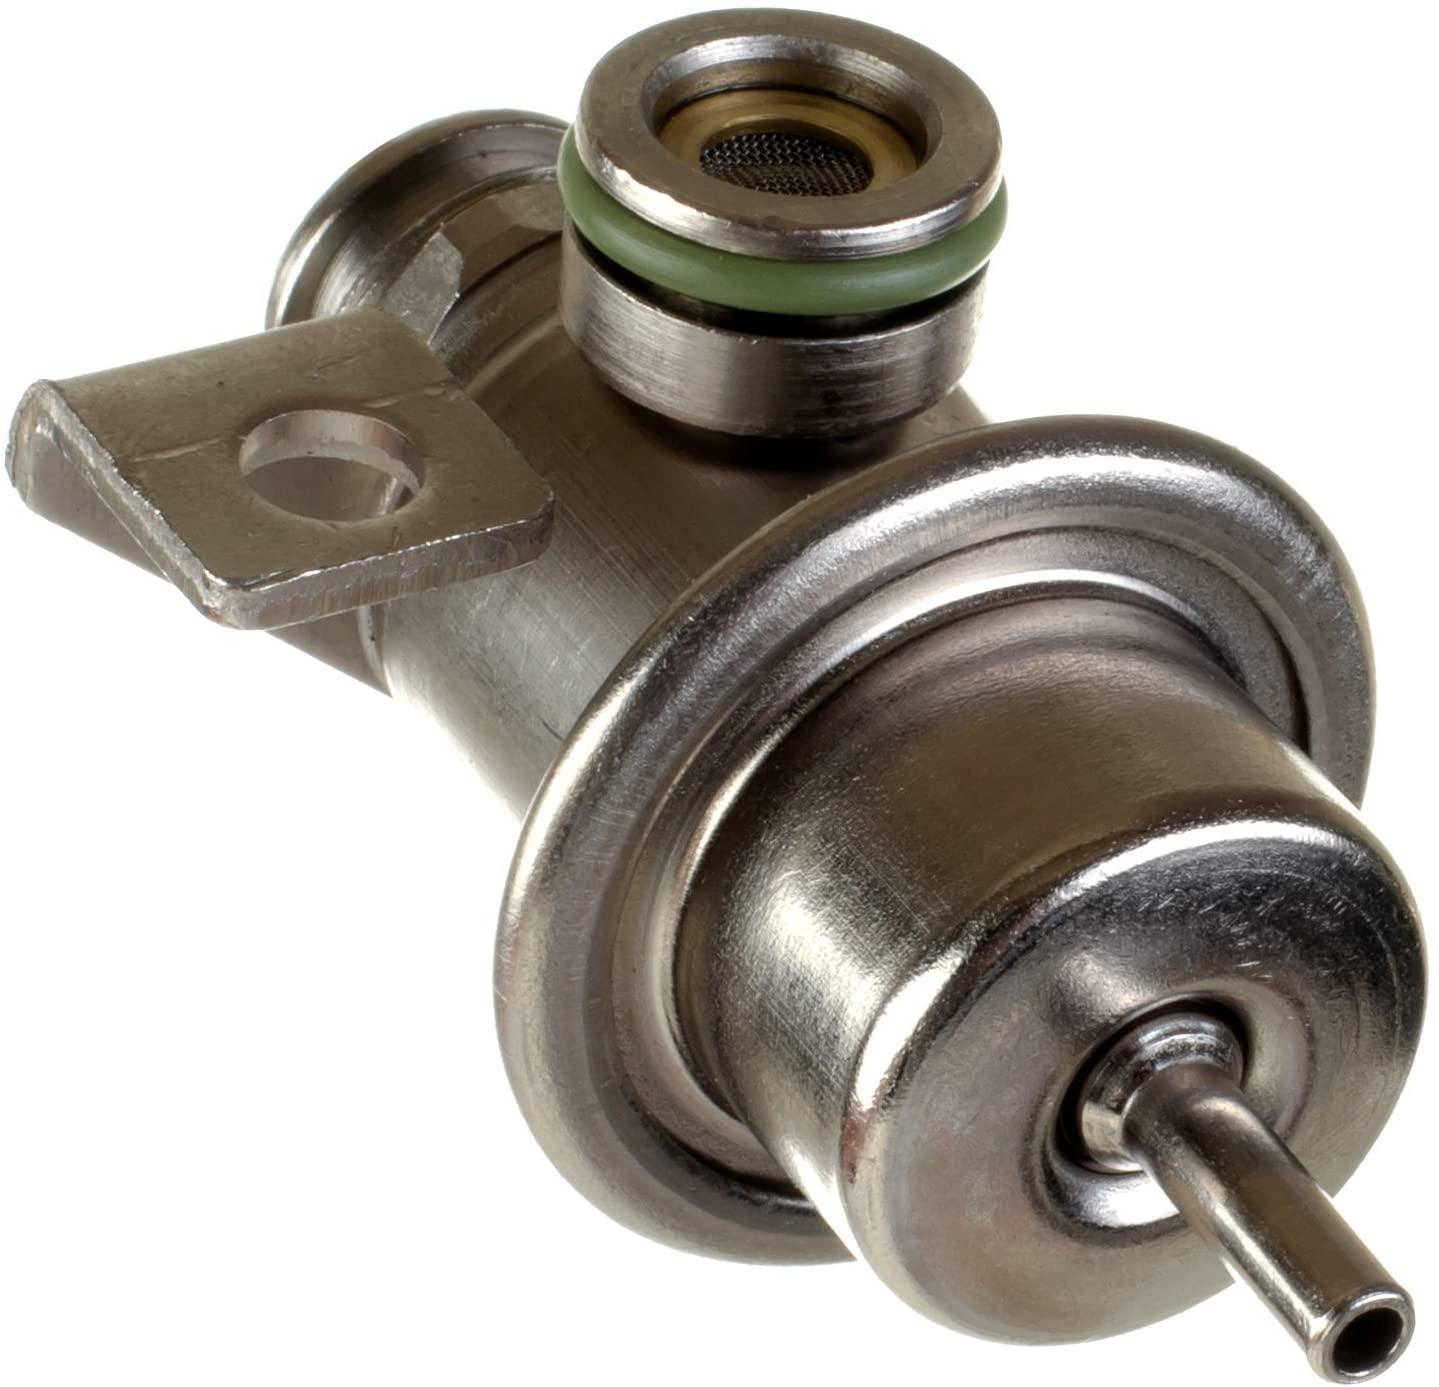 Delphi FP10300 Fuel Injection Pressure Regulator